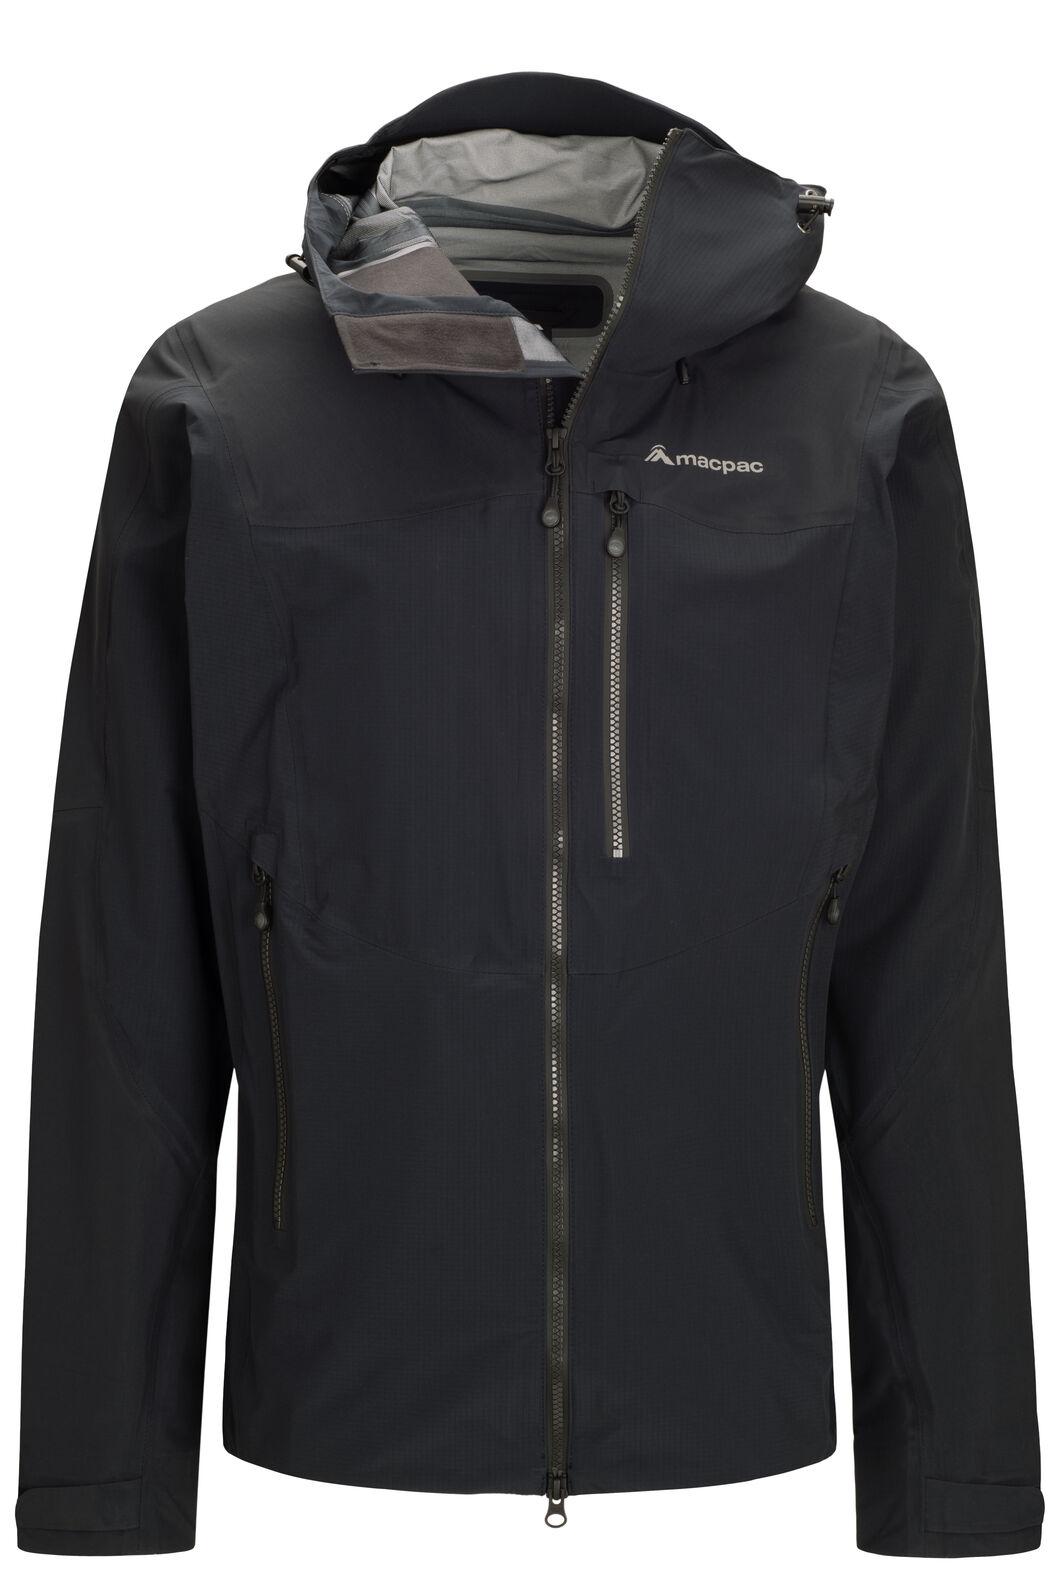 Macpac Men's Lightweight Prophet Pertex® Rain Jacket, Black/Black, hi-res